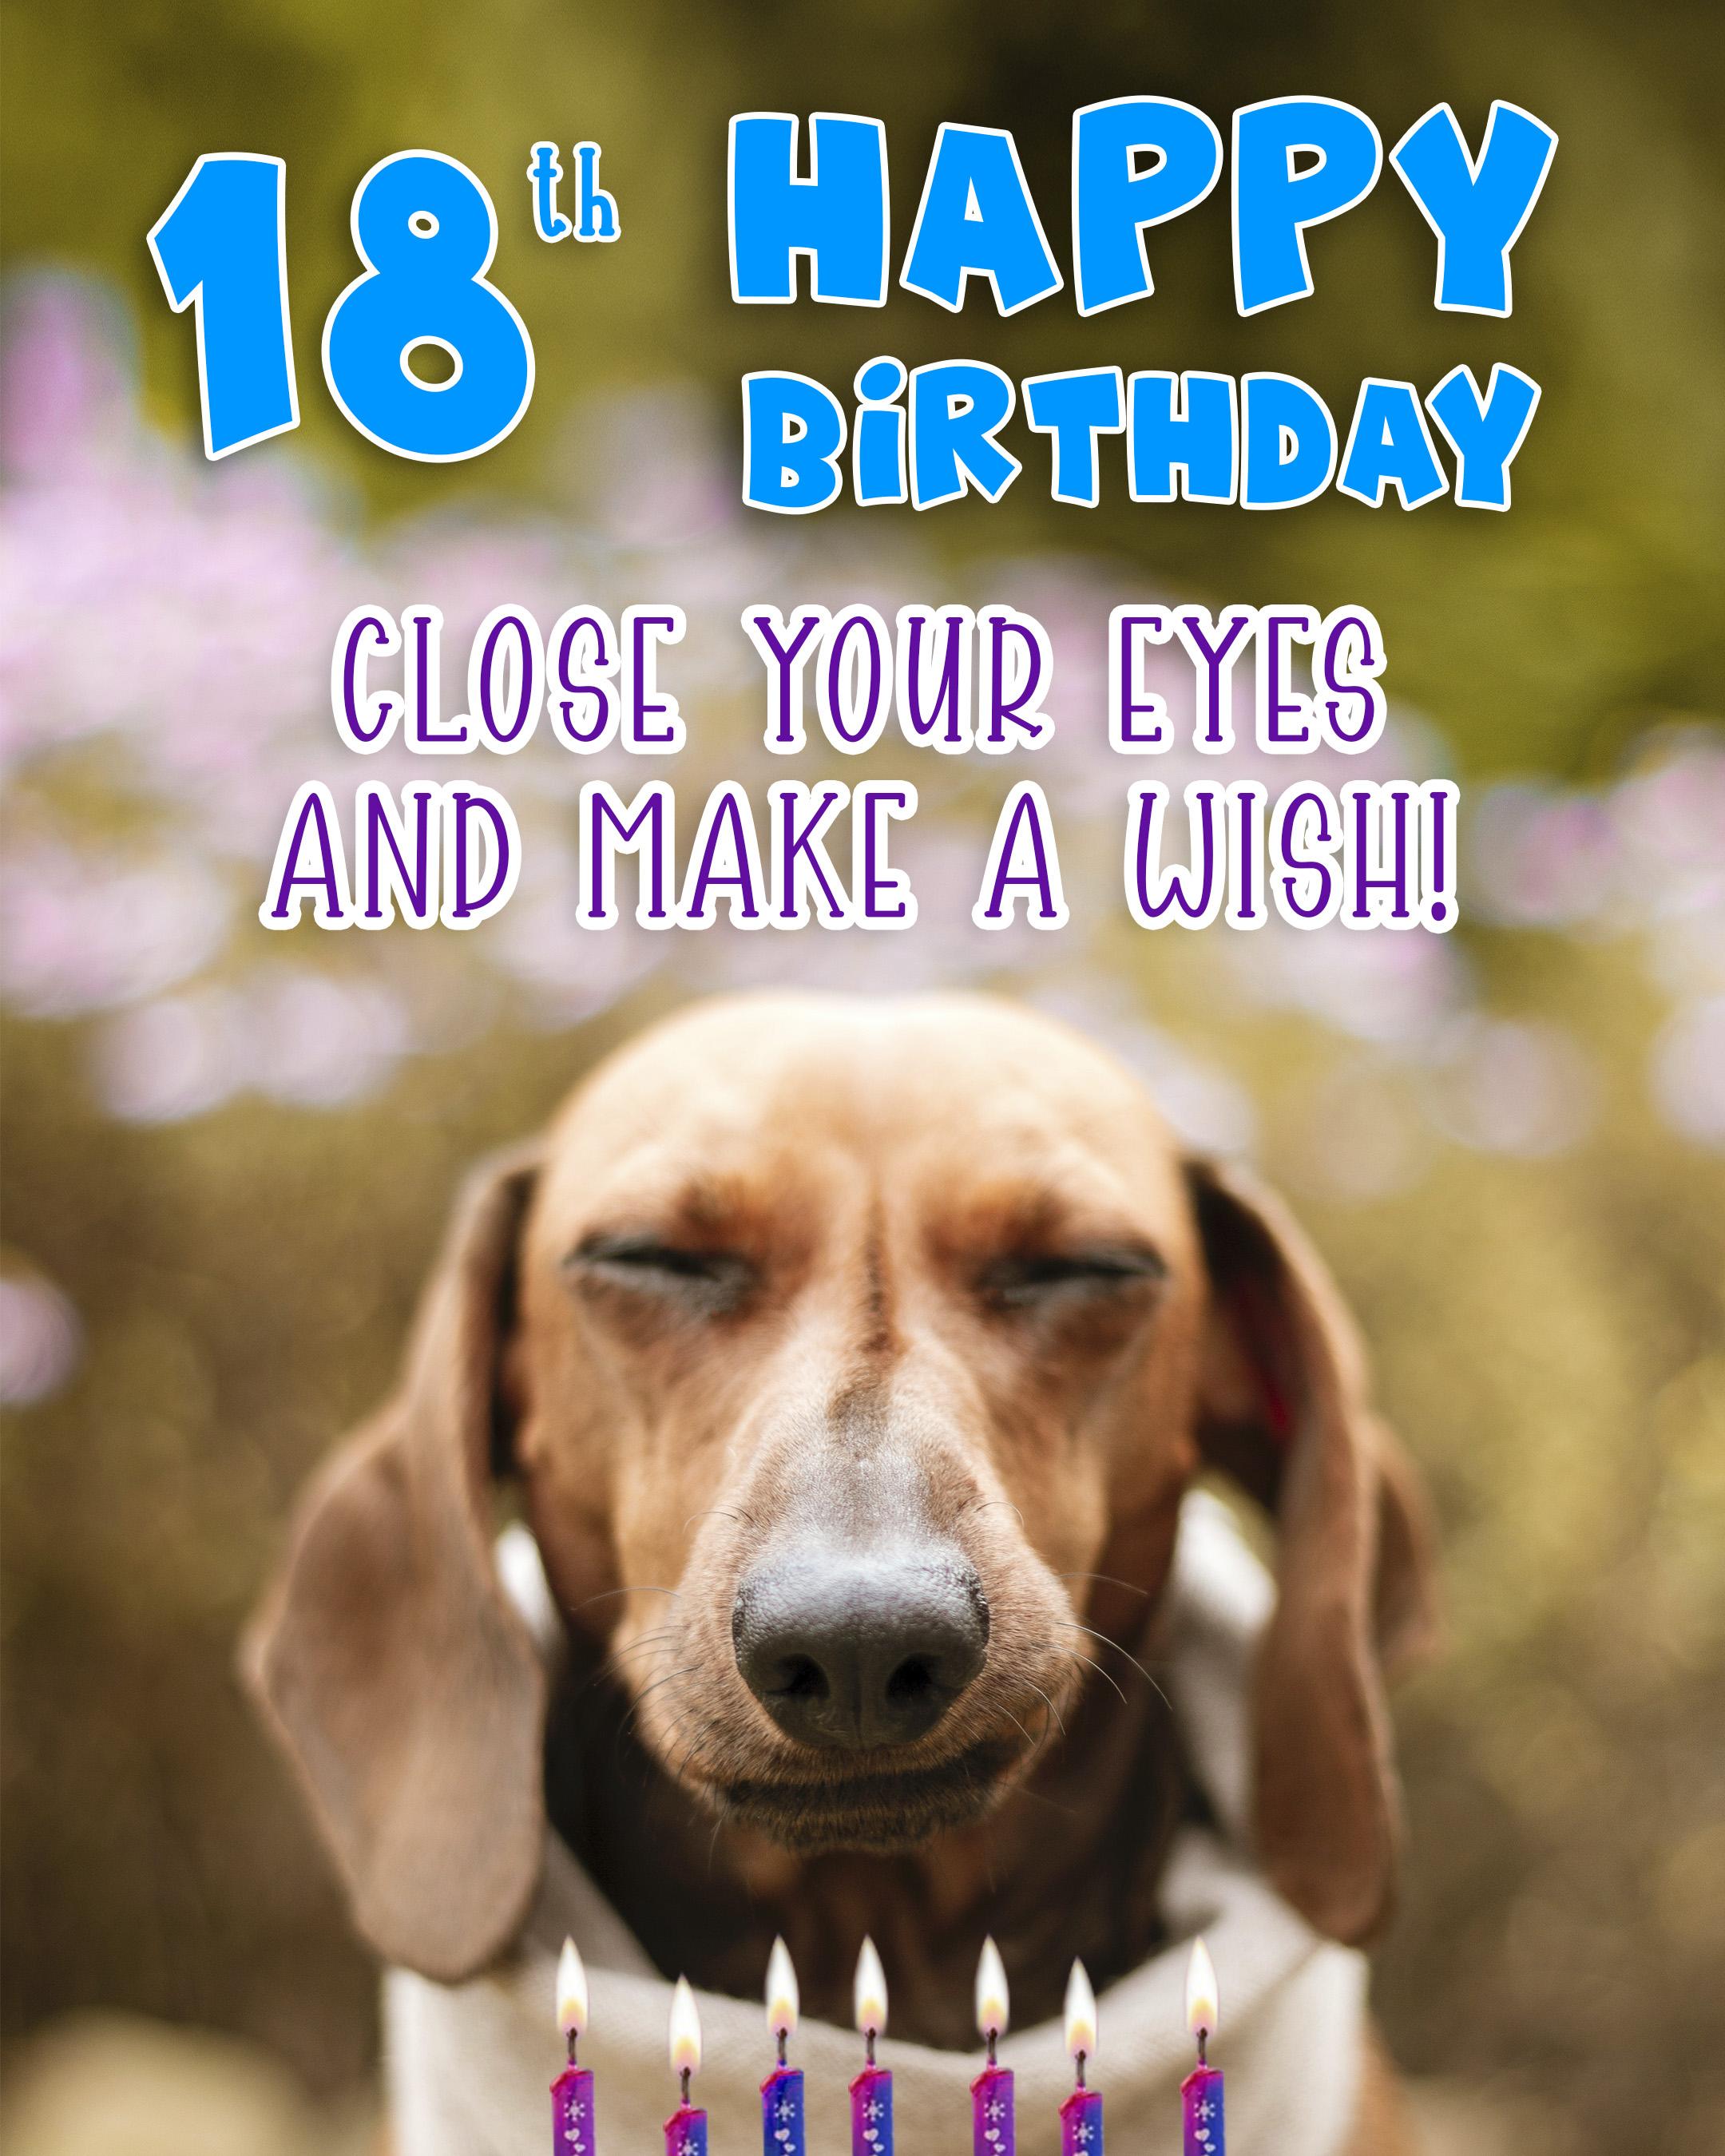 Free 18th Years Happy Birthday Image With Cute Dog - birthdayimg.com